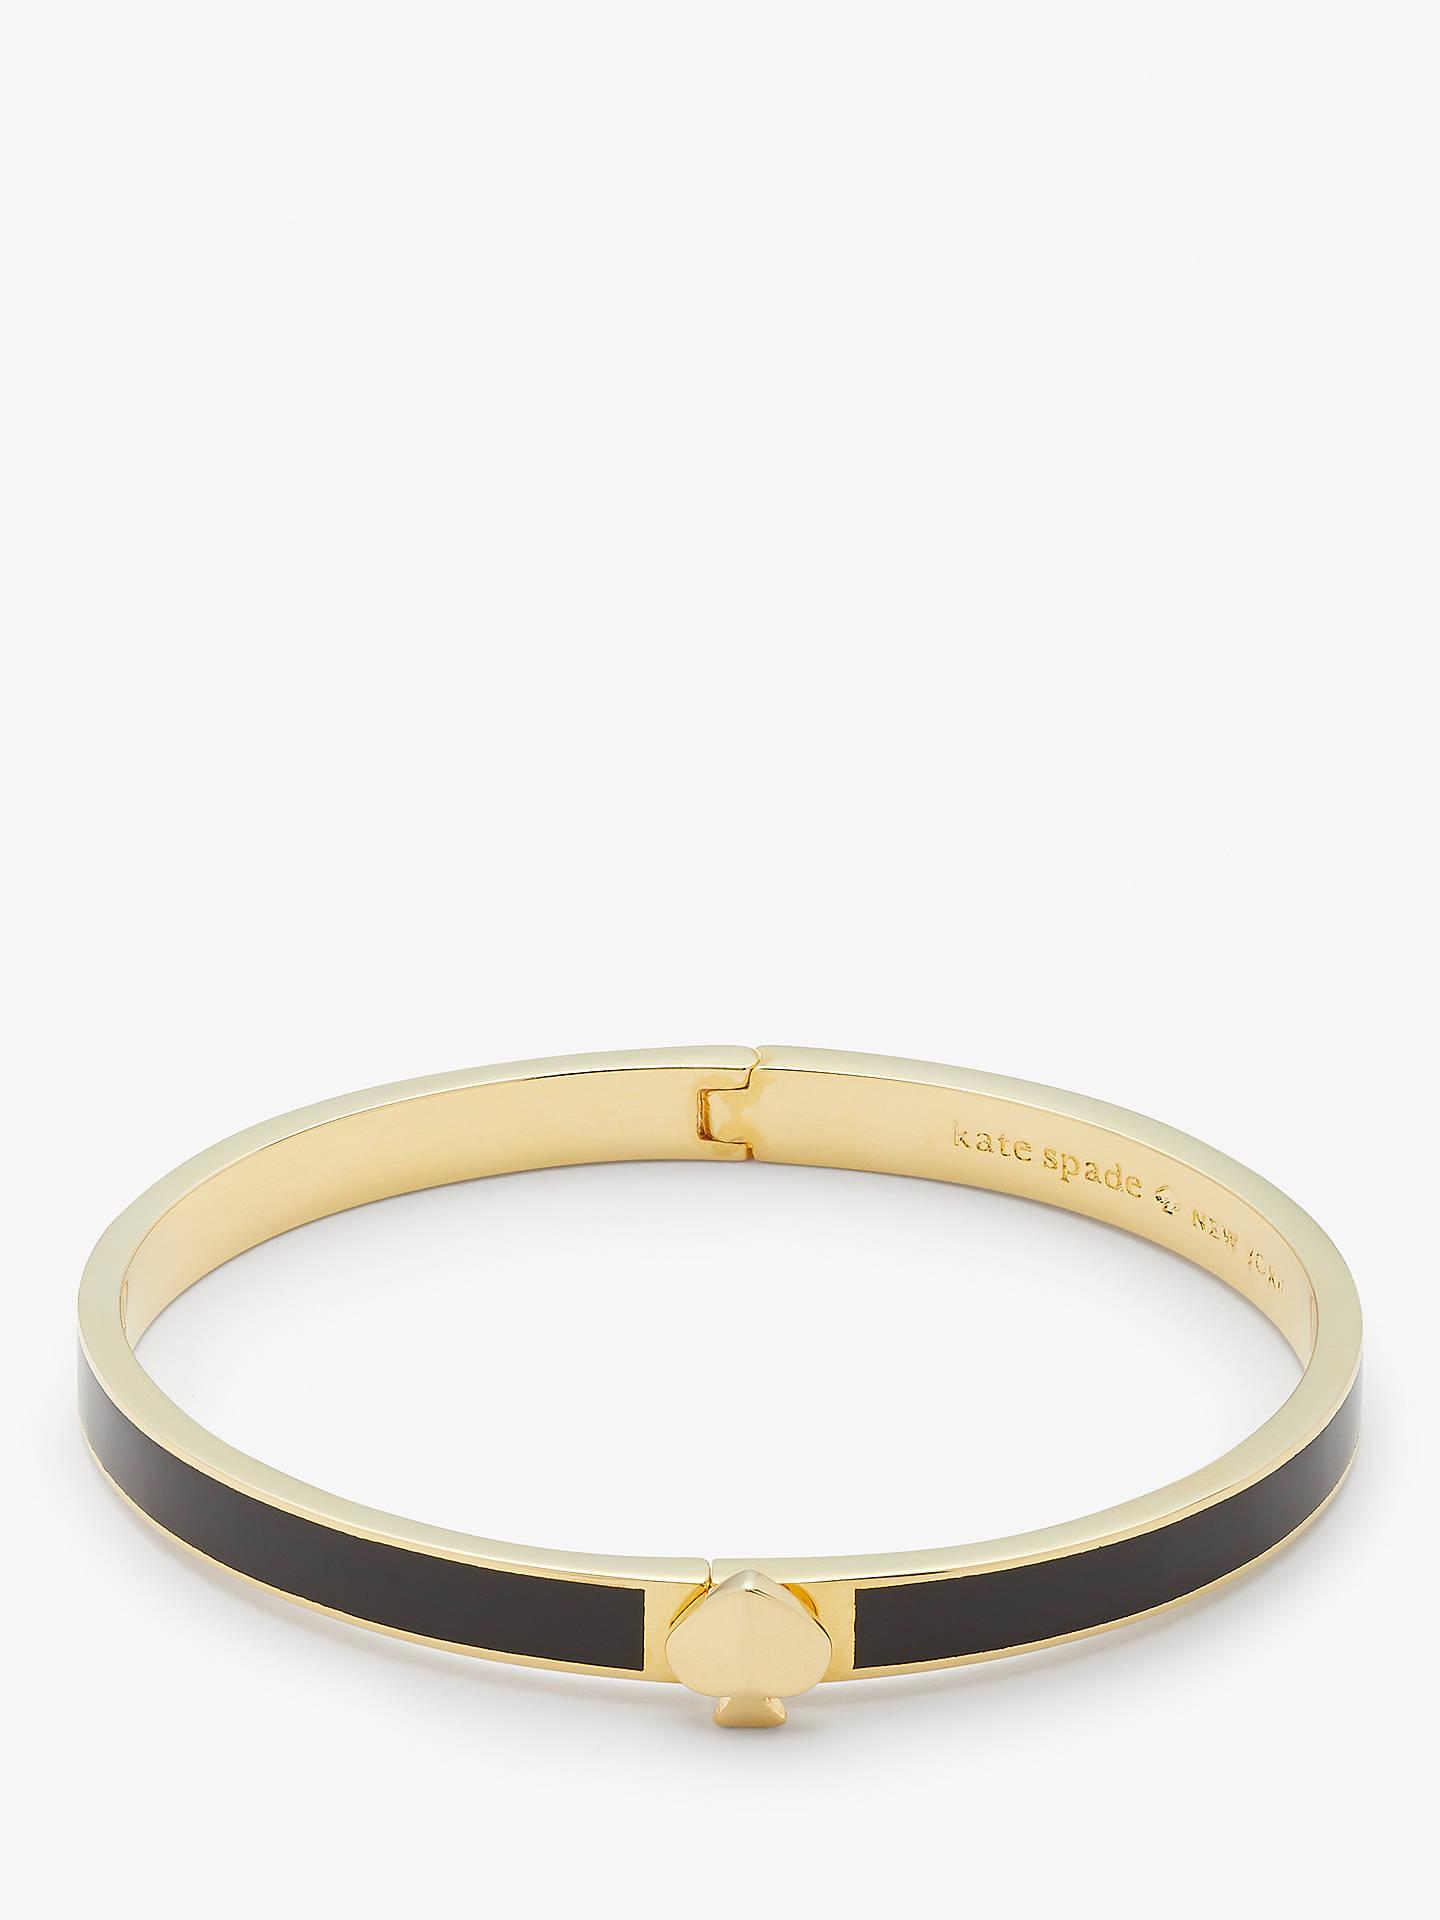 29328c9f32d15 kate spade new york Logo Enamel Bangle, Gold/Black